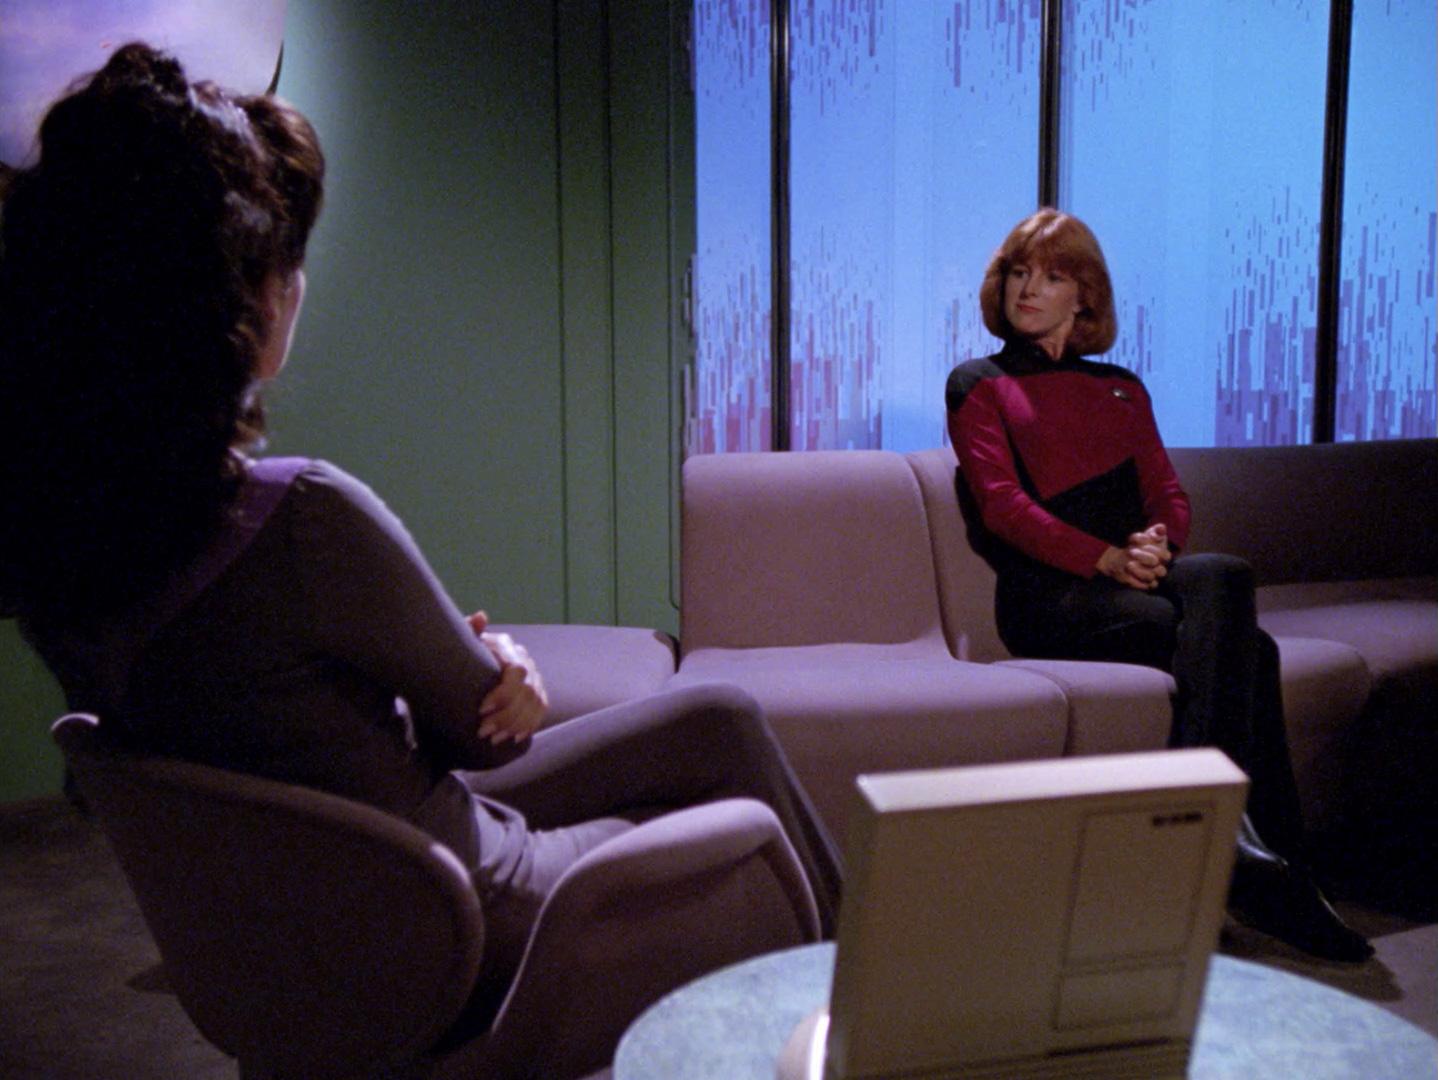 4x10 The Loss Trekcore Star Trek Tng Hd Screencap